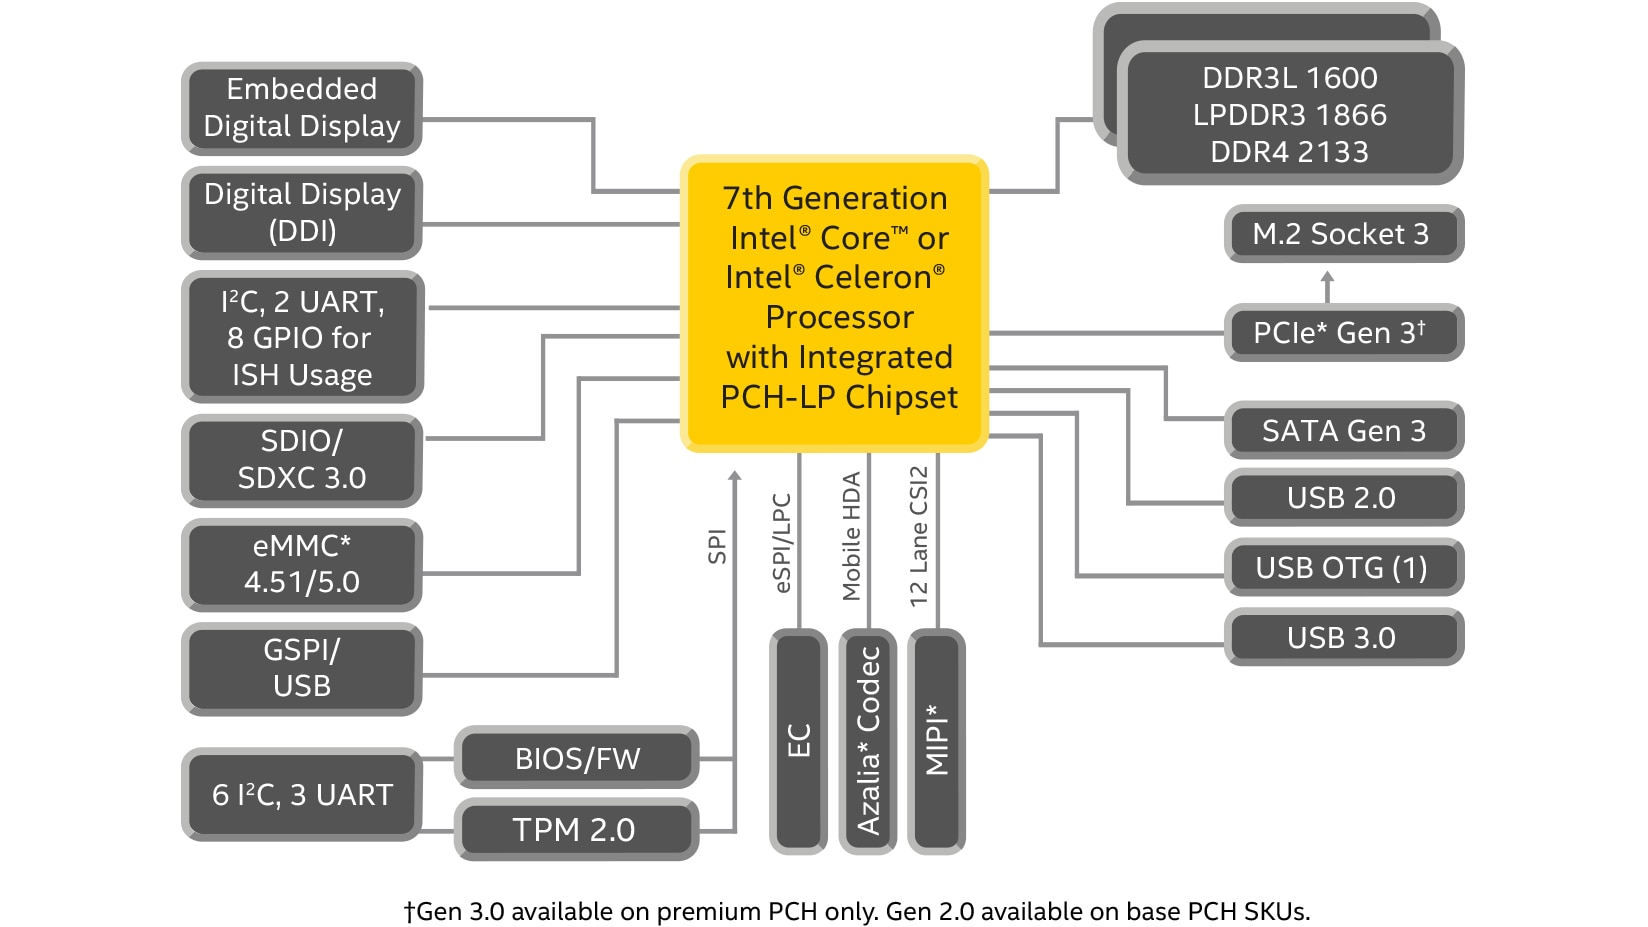 7th Generation Intel Core Mobile Processor Specifications